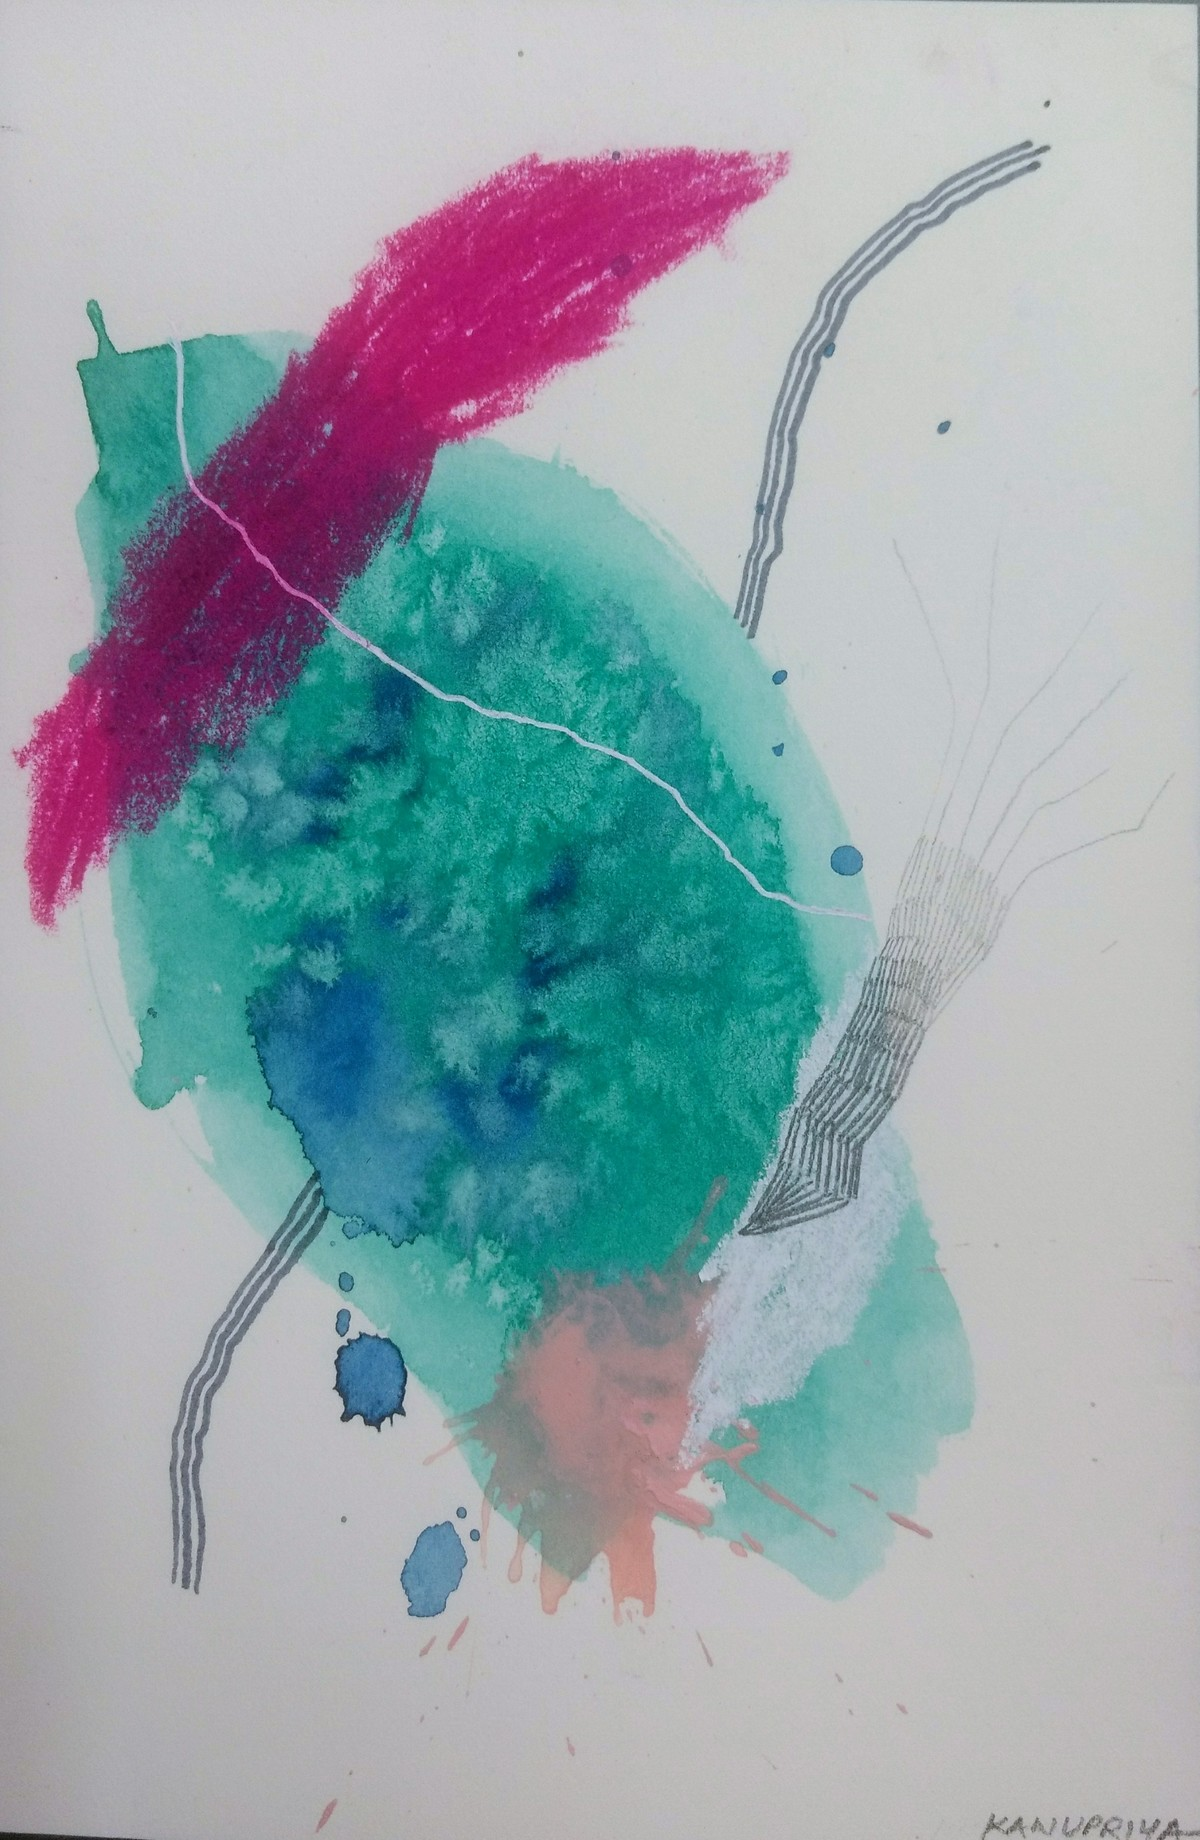 Plankton by Kanupriya Bakshi, Abstract Painting, Mixed Media on Paper, Gray color